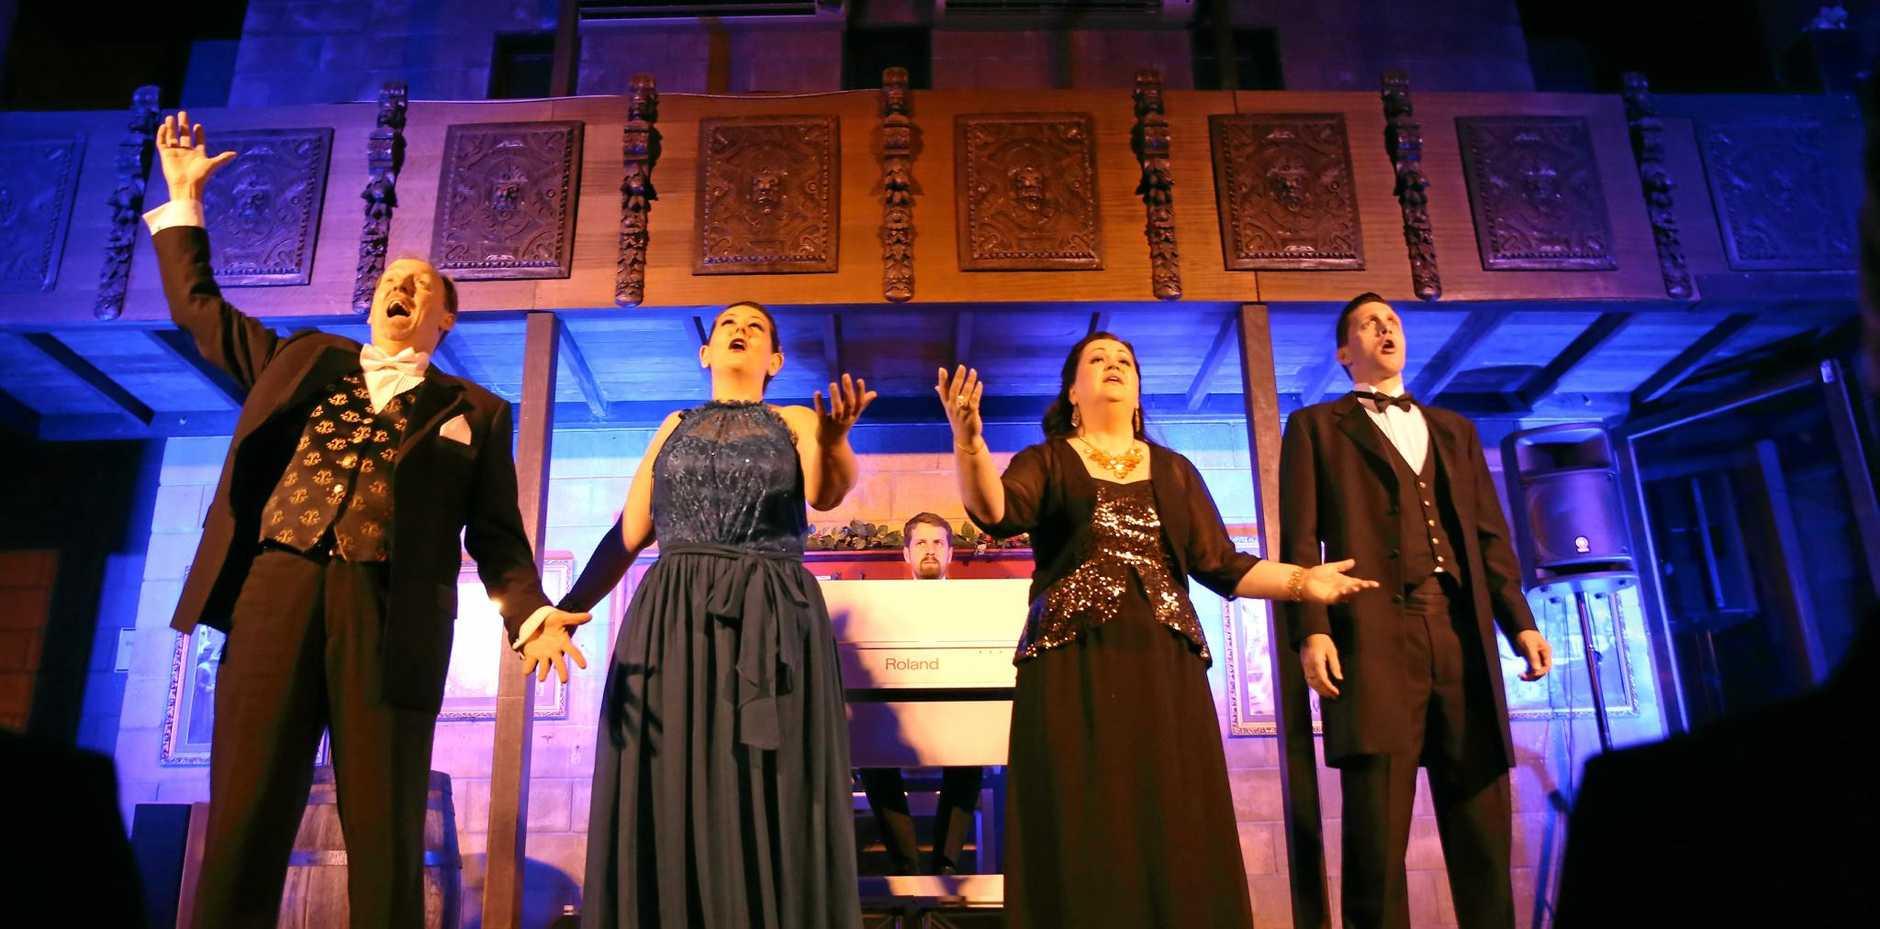 Opera in the Castle at Bli Bli with the Underground Opera Company stars.